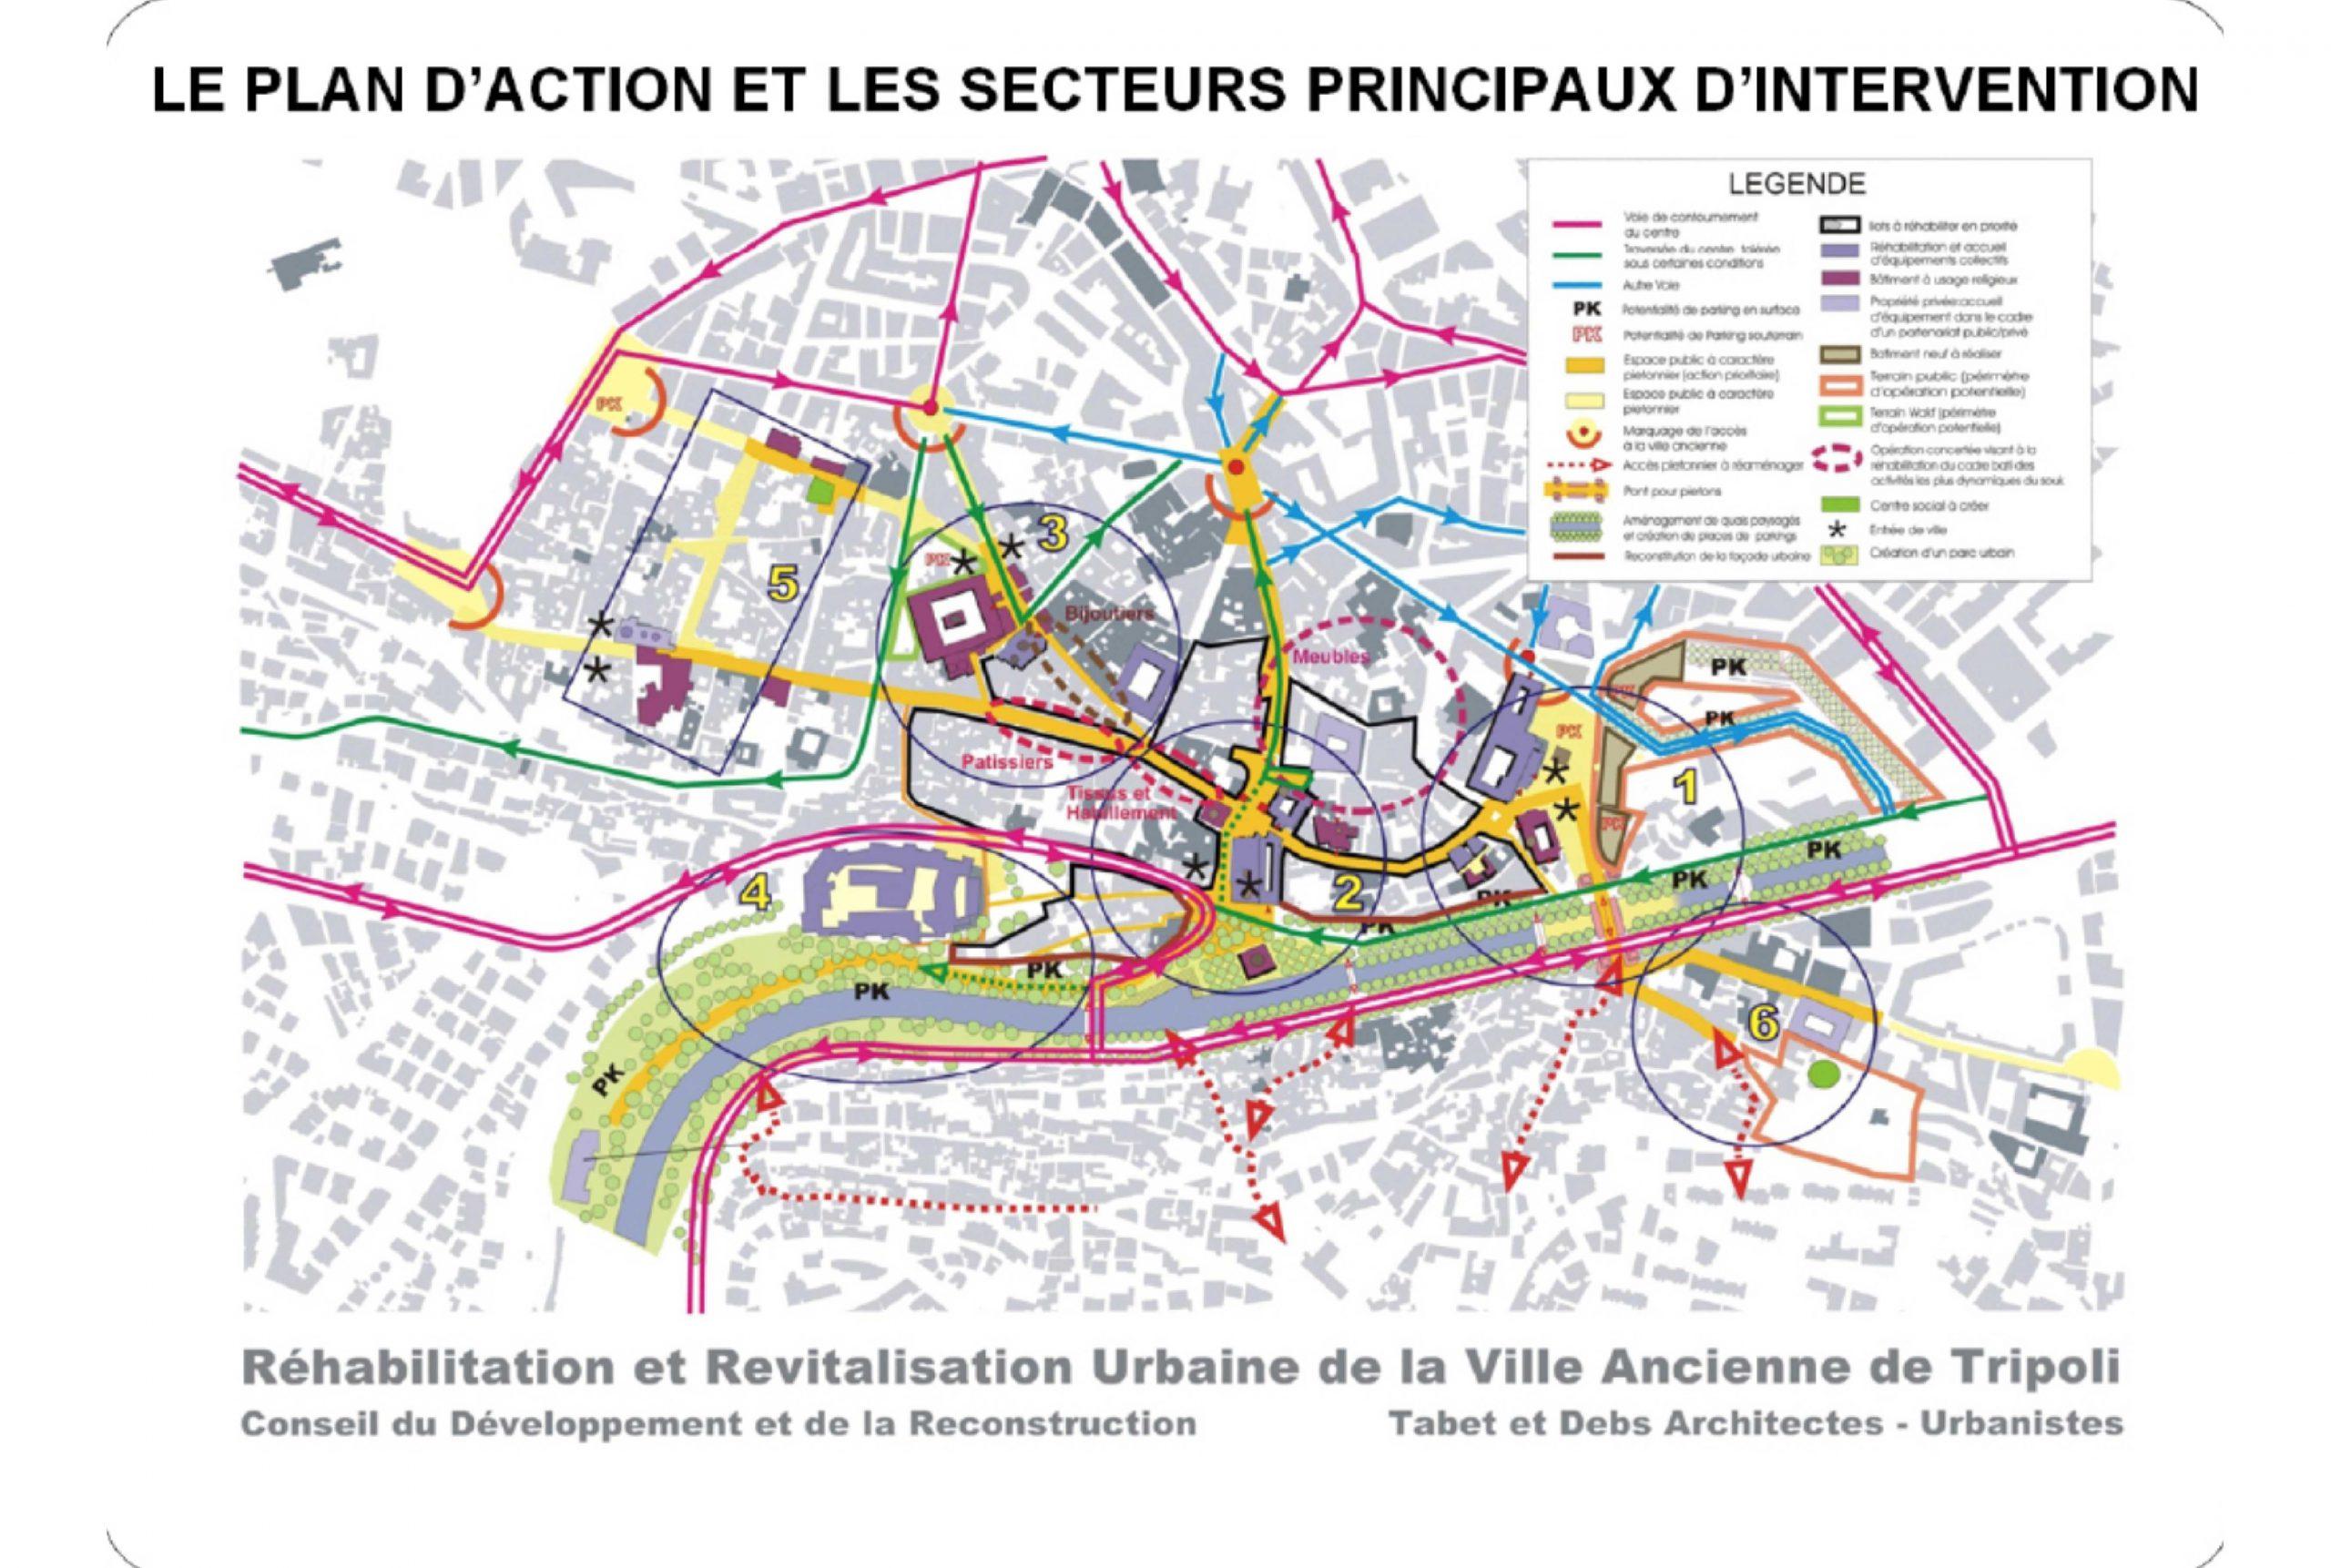 Projet urbanisme Tripoli 6 par Atelier JS Tabet